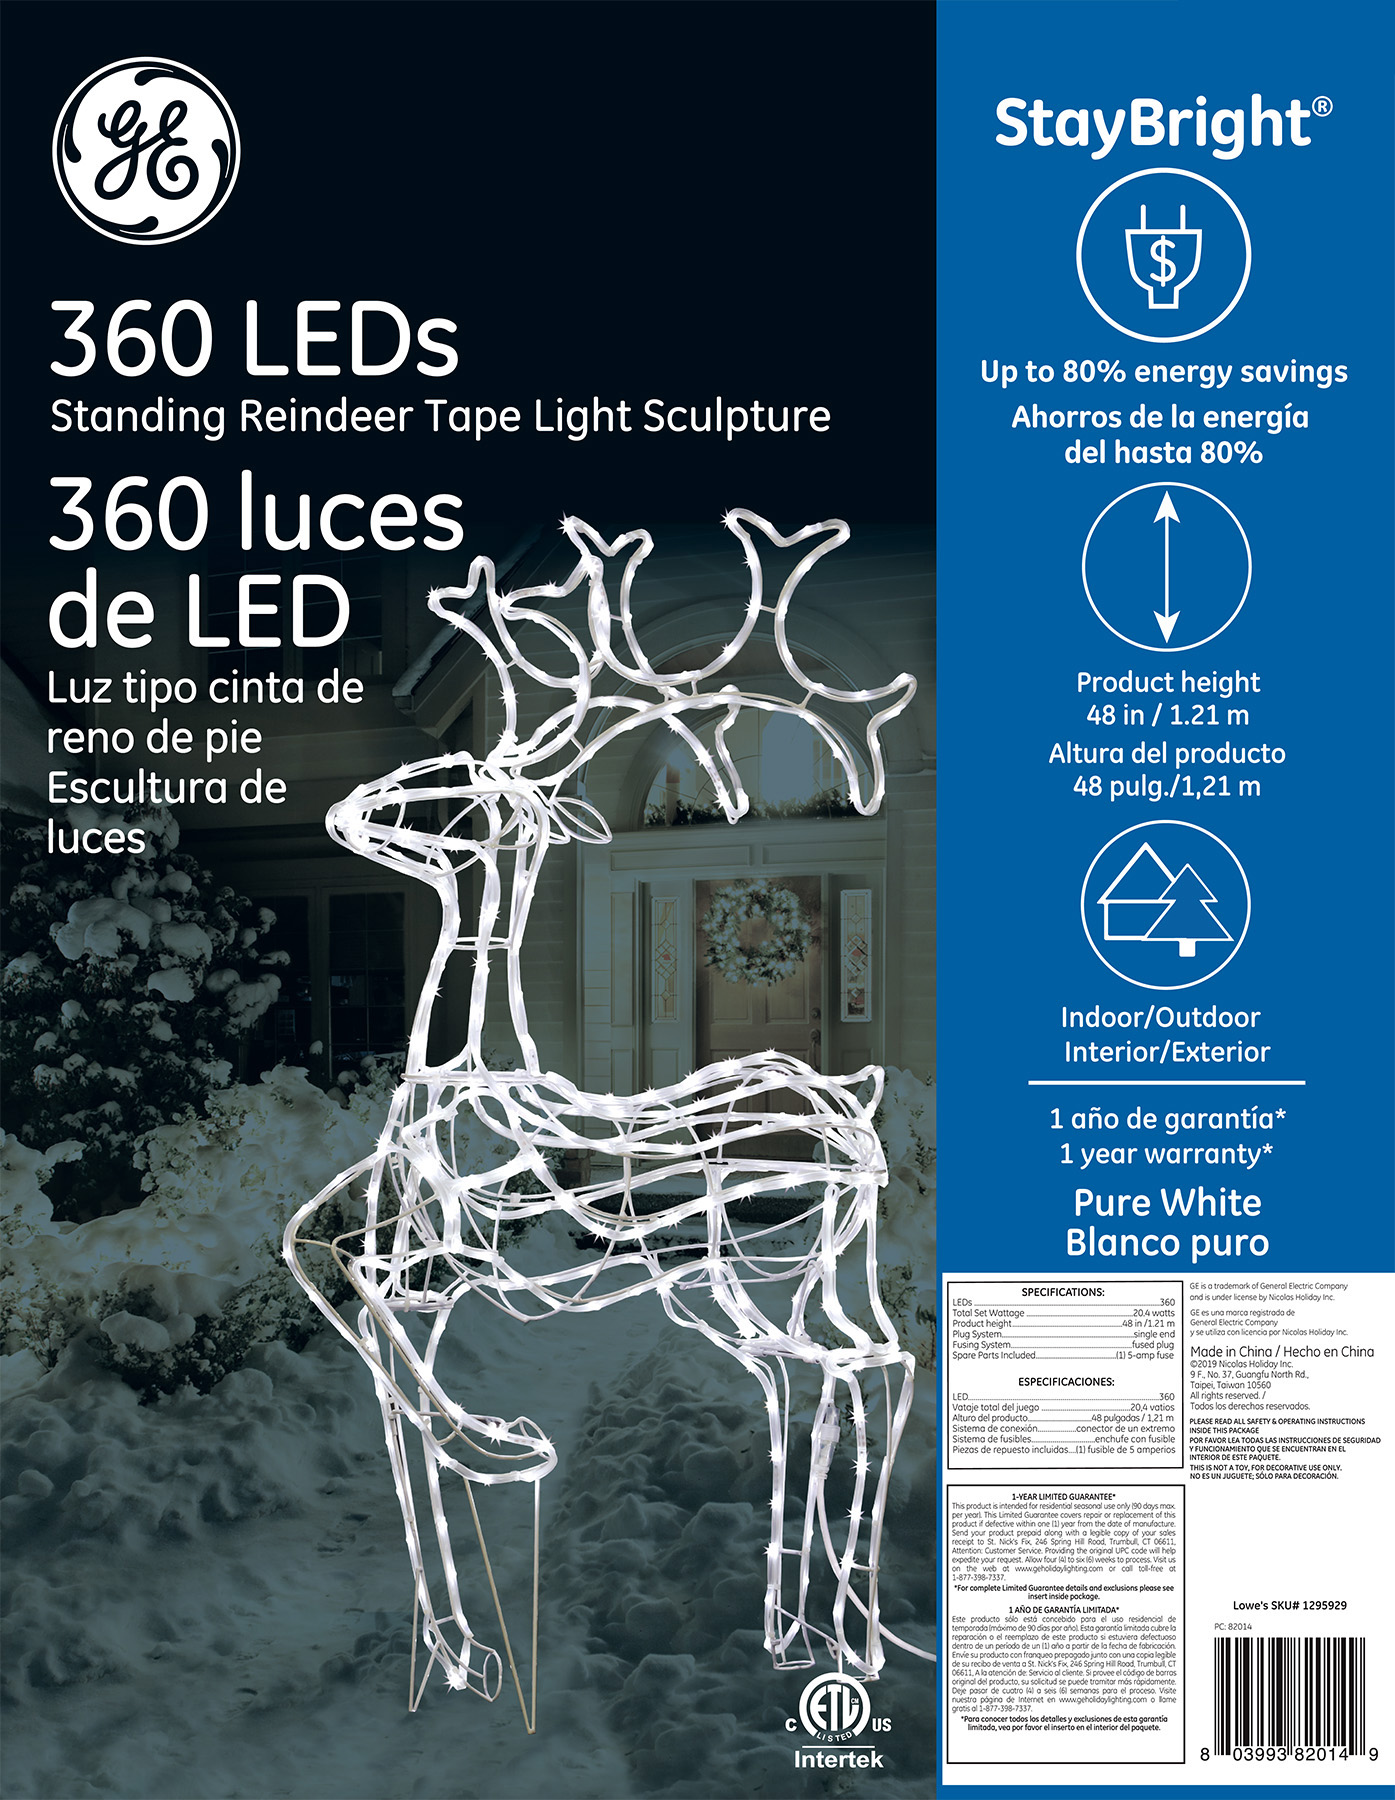 82014 Ge Staybright 174 Led Standing Reindeer Tape Light